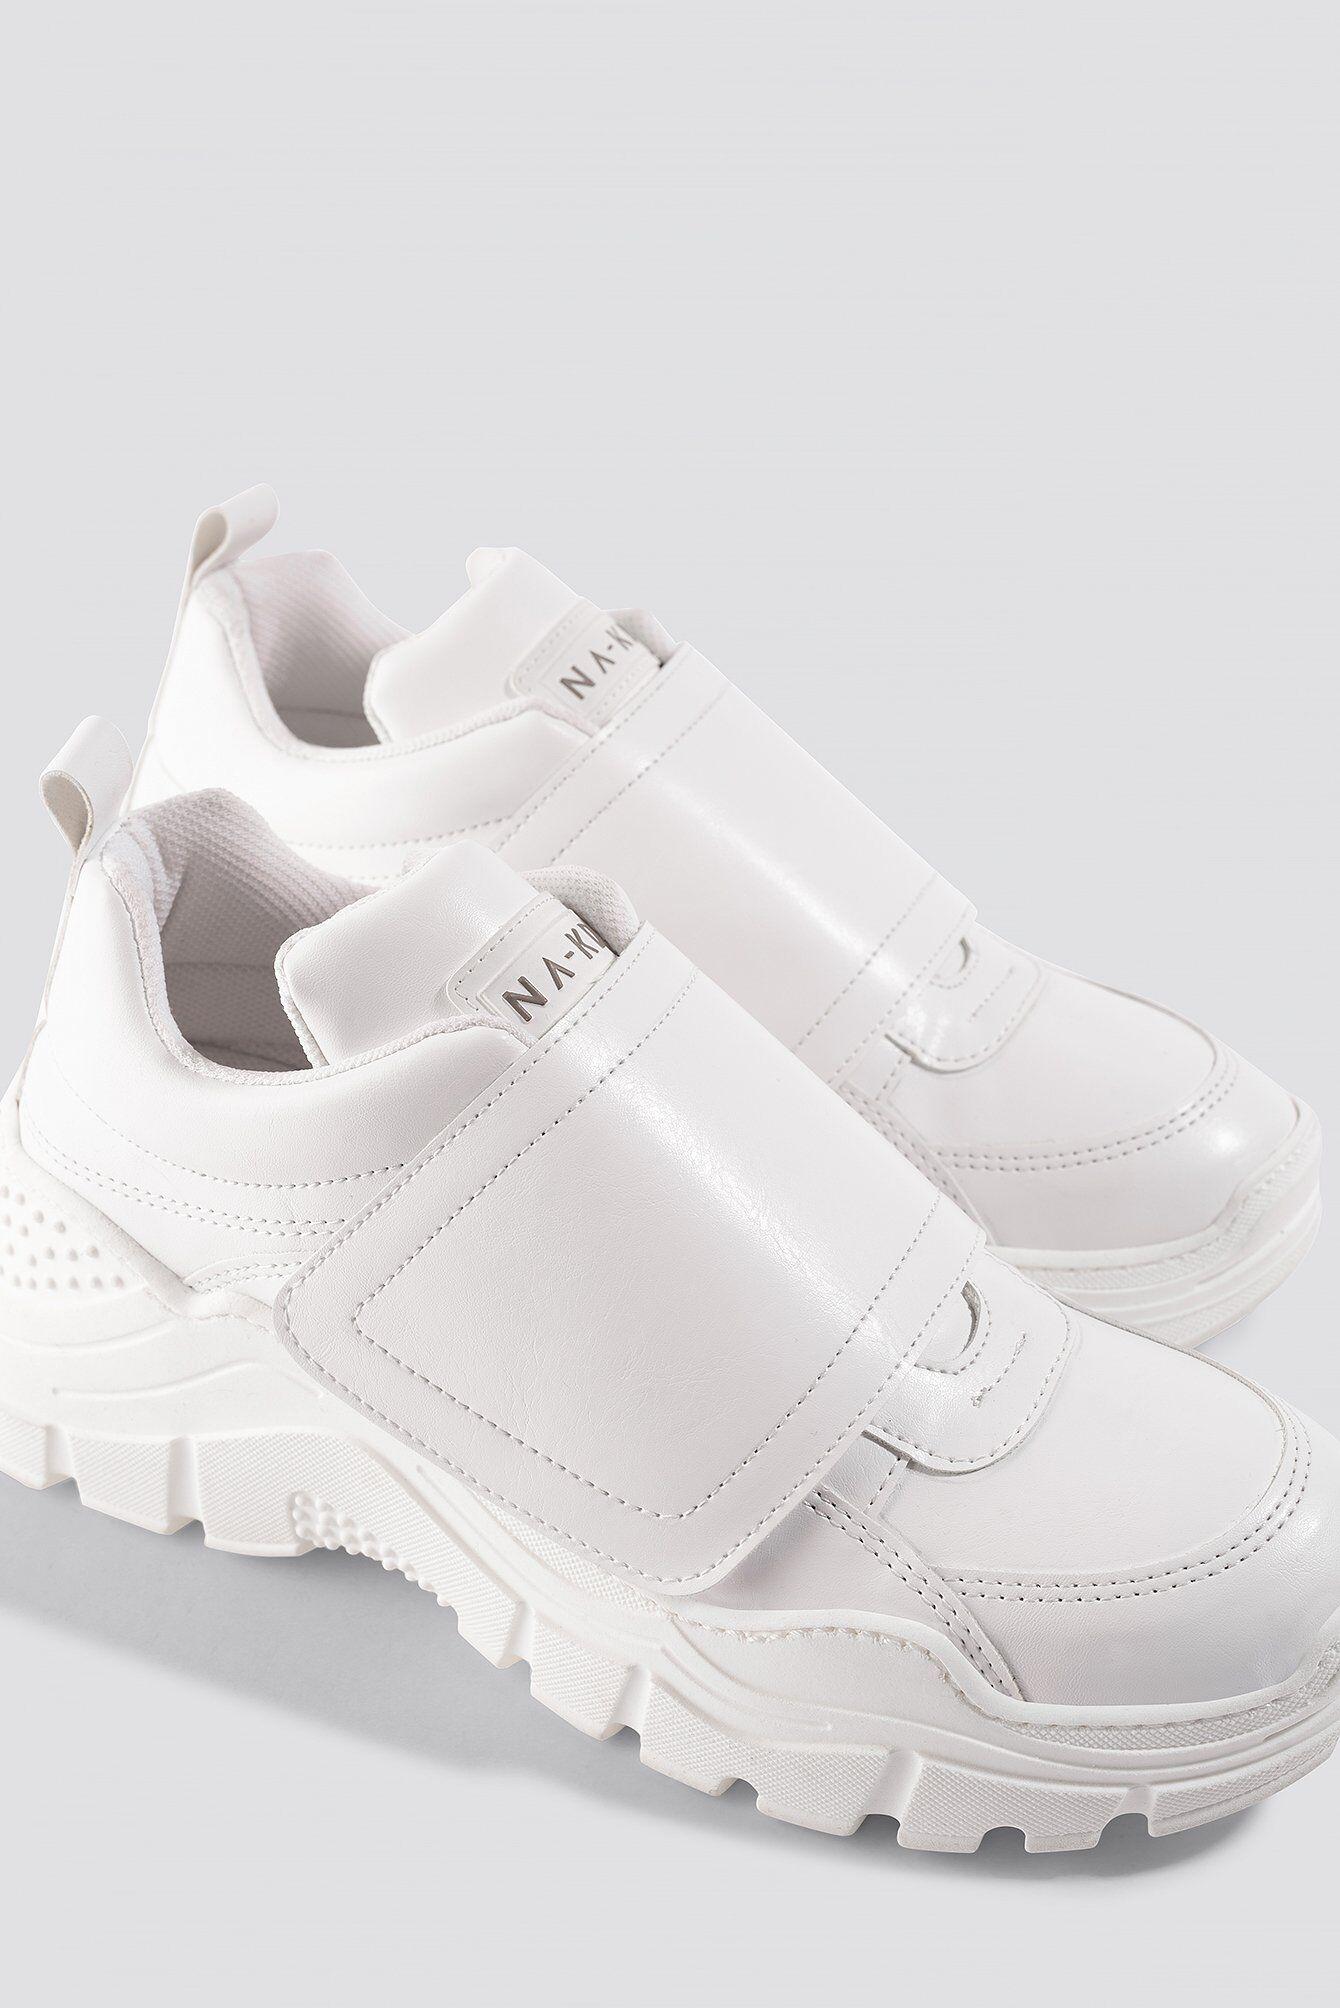 NA-KD Shoes Big Velcro Chunky Trainers - White  - Size: EU 36,EU 37,EU 38,EU 39,EU 40,EU 41